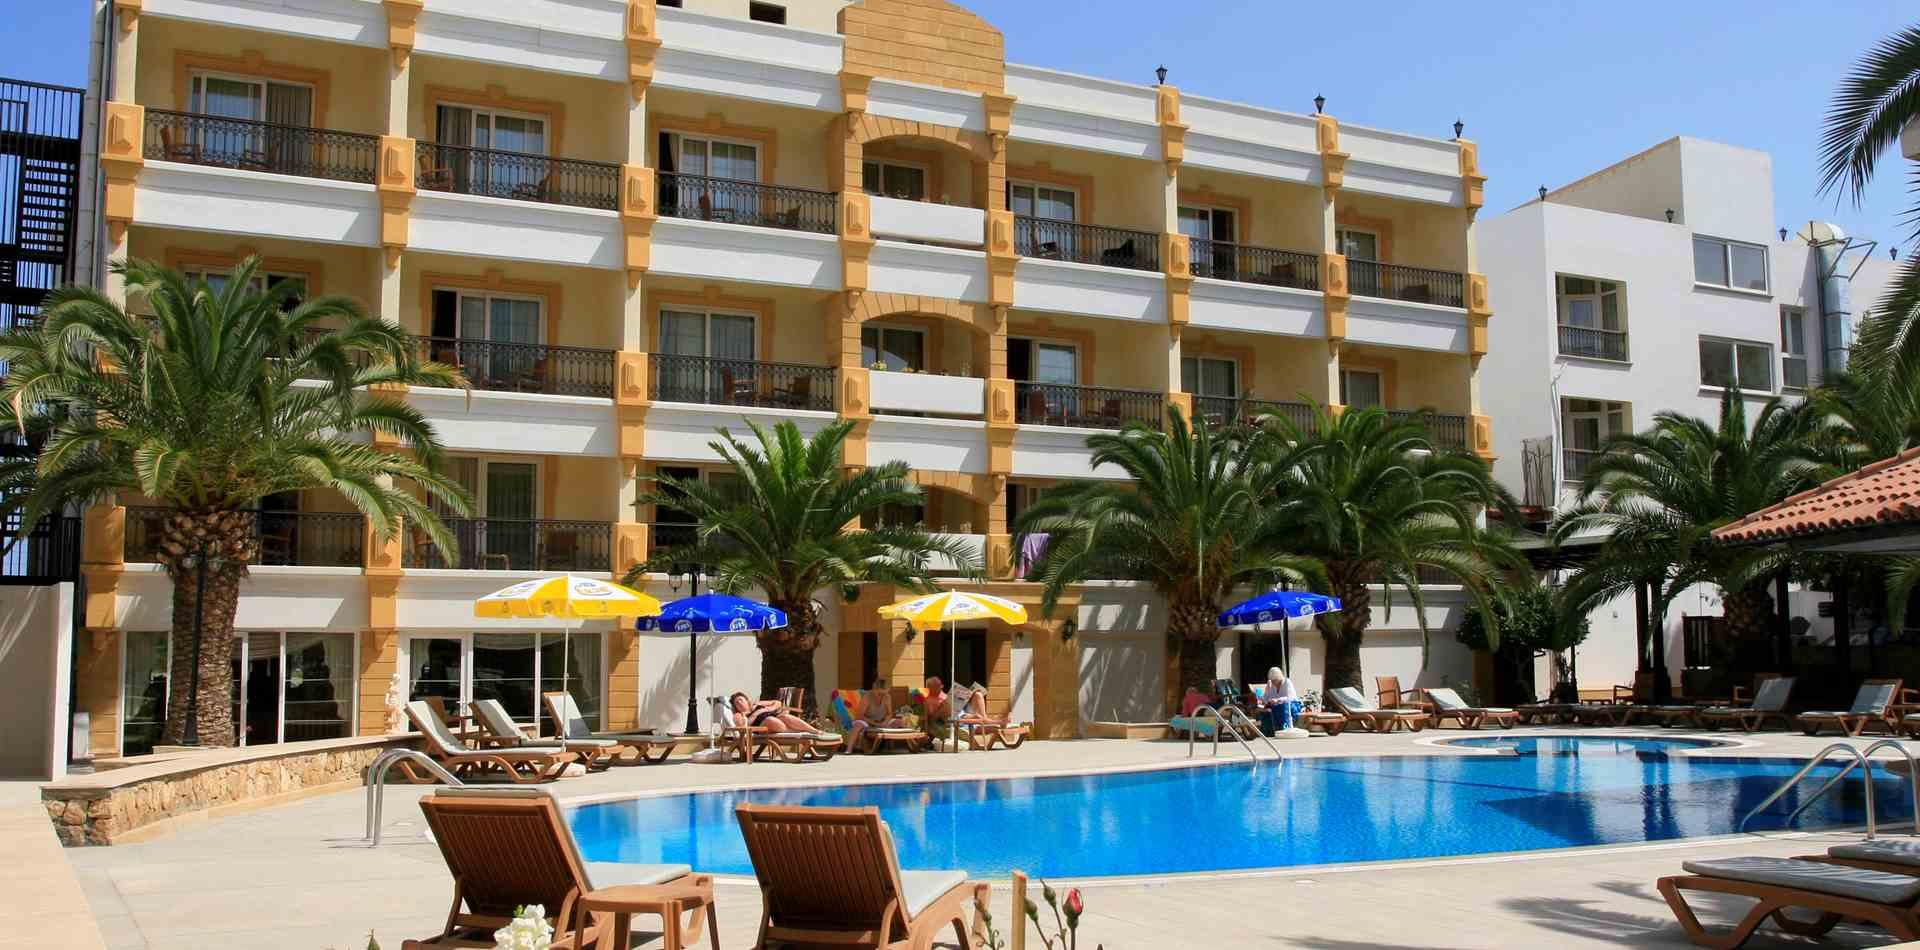 Pia Bella Hotel, Kyrenia, North Cyprus Holidays